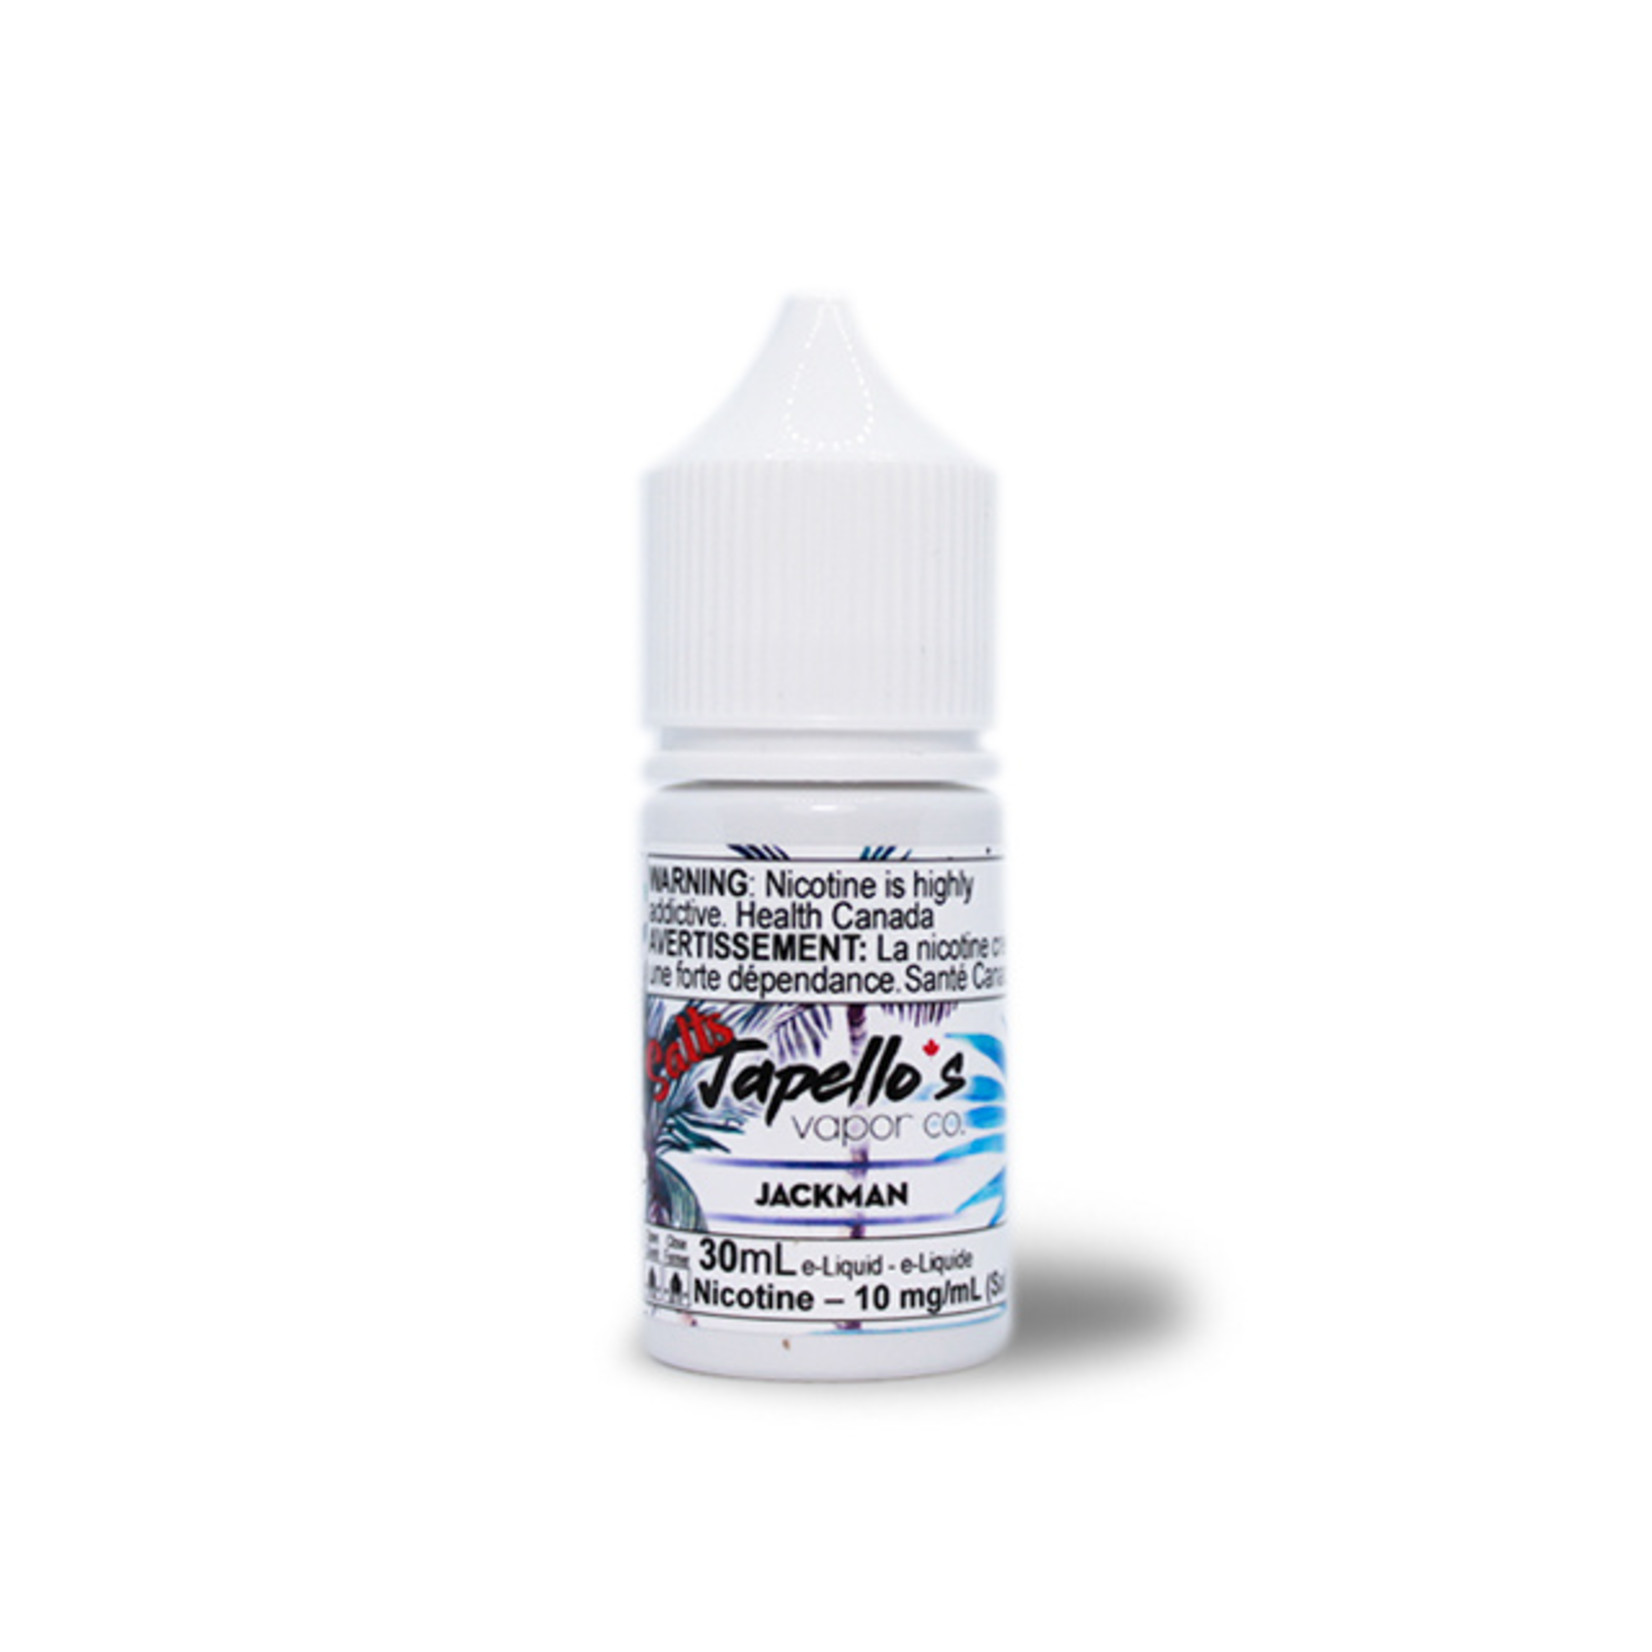 Japello's Jackman Salt